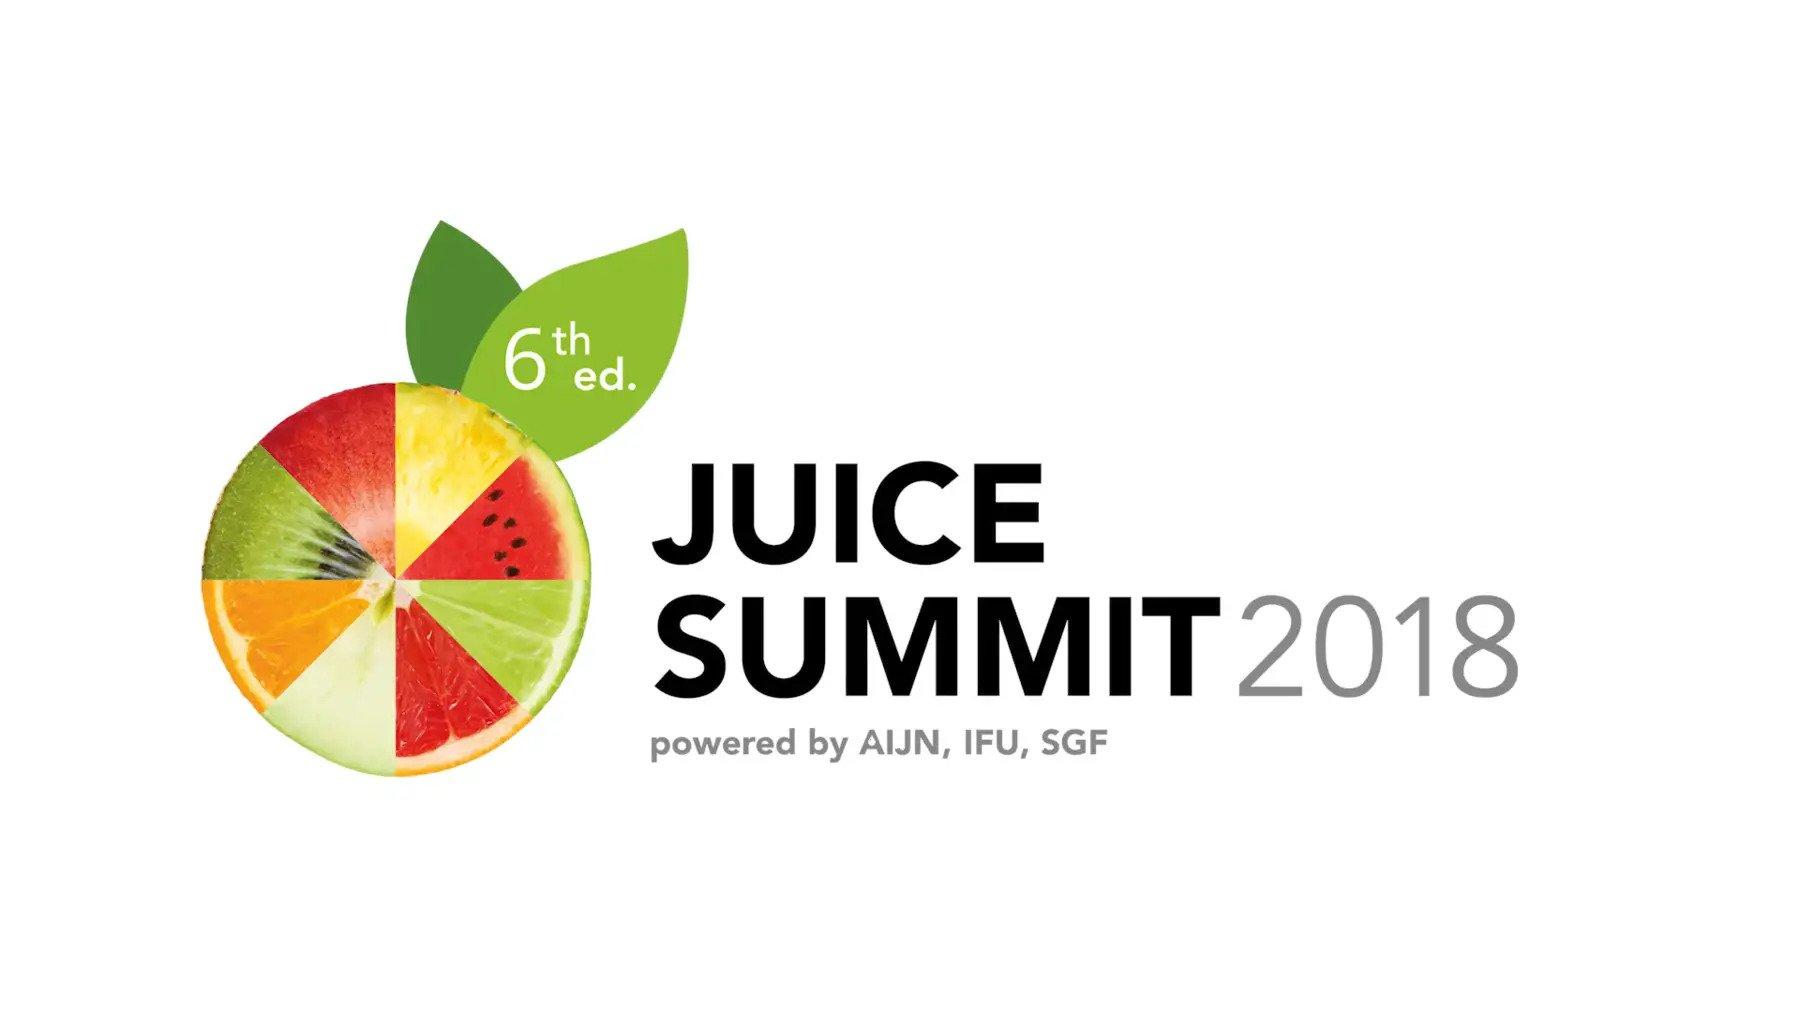 Juice Summit 2018